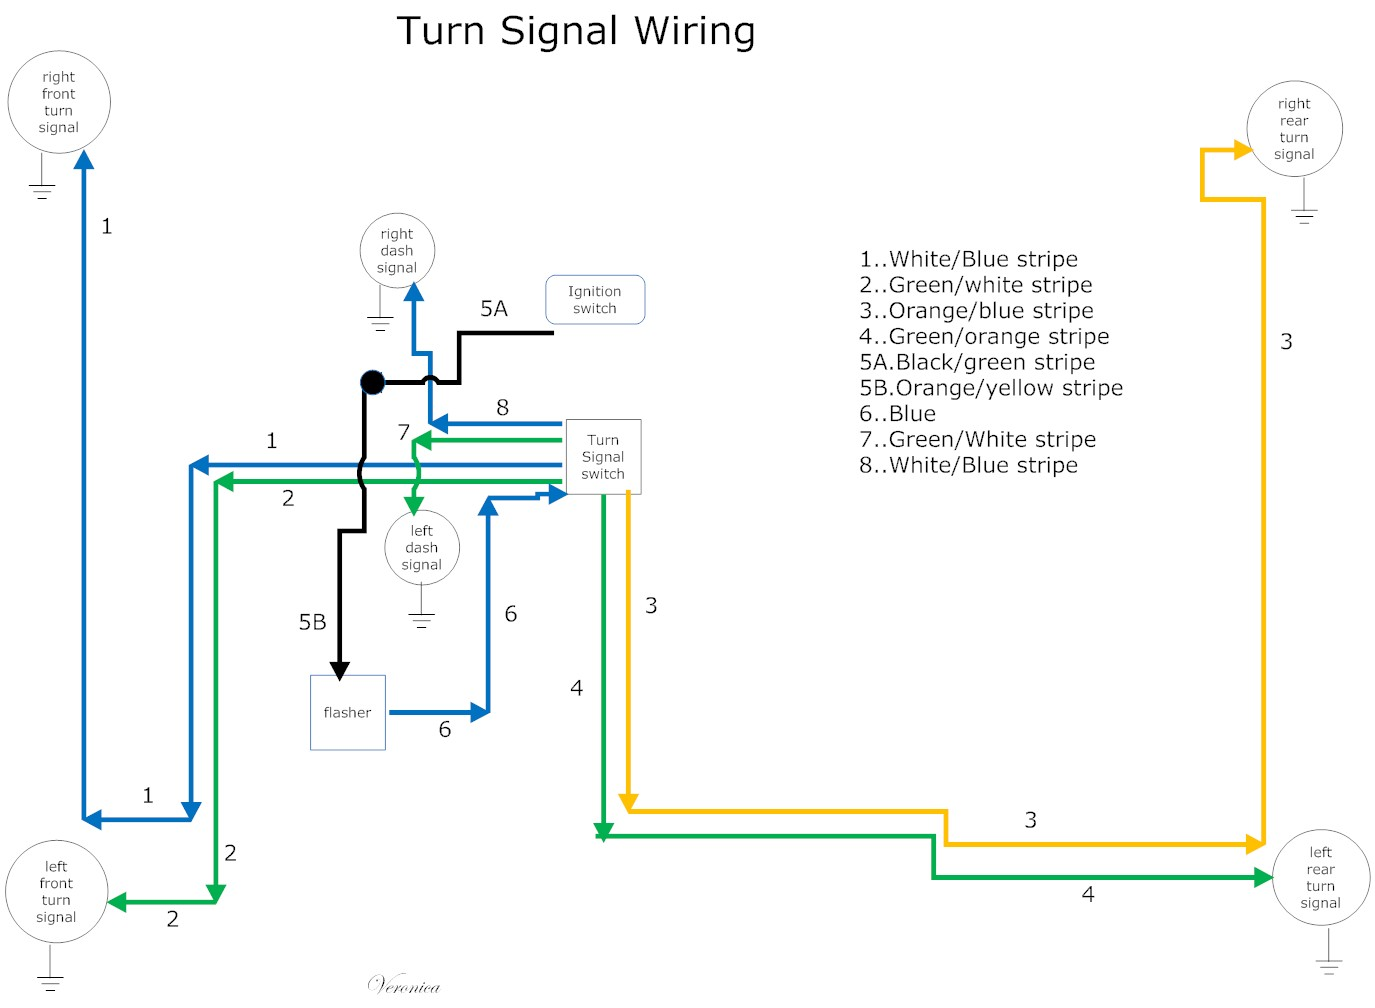 ron francis wiring diagram 65 mustang